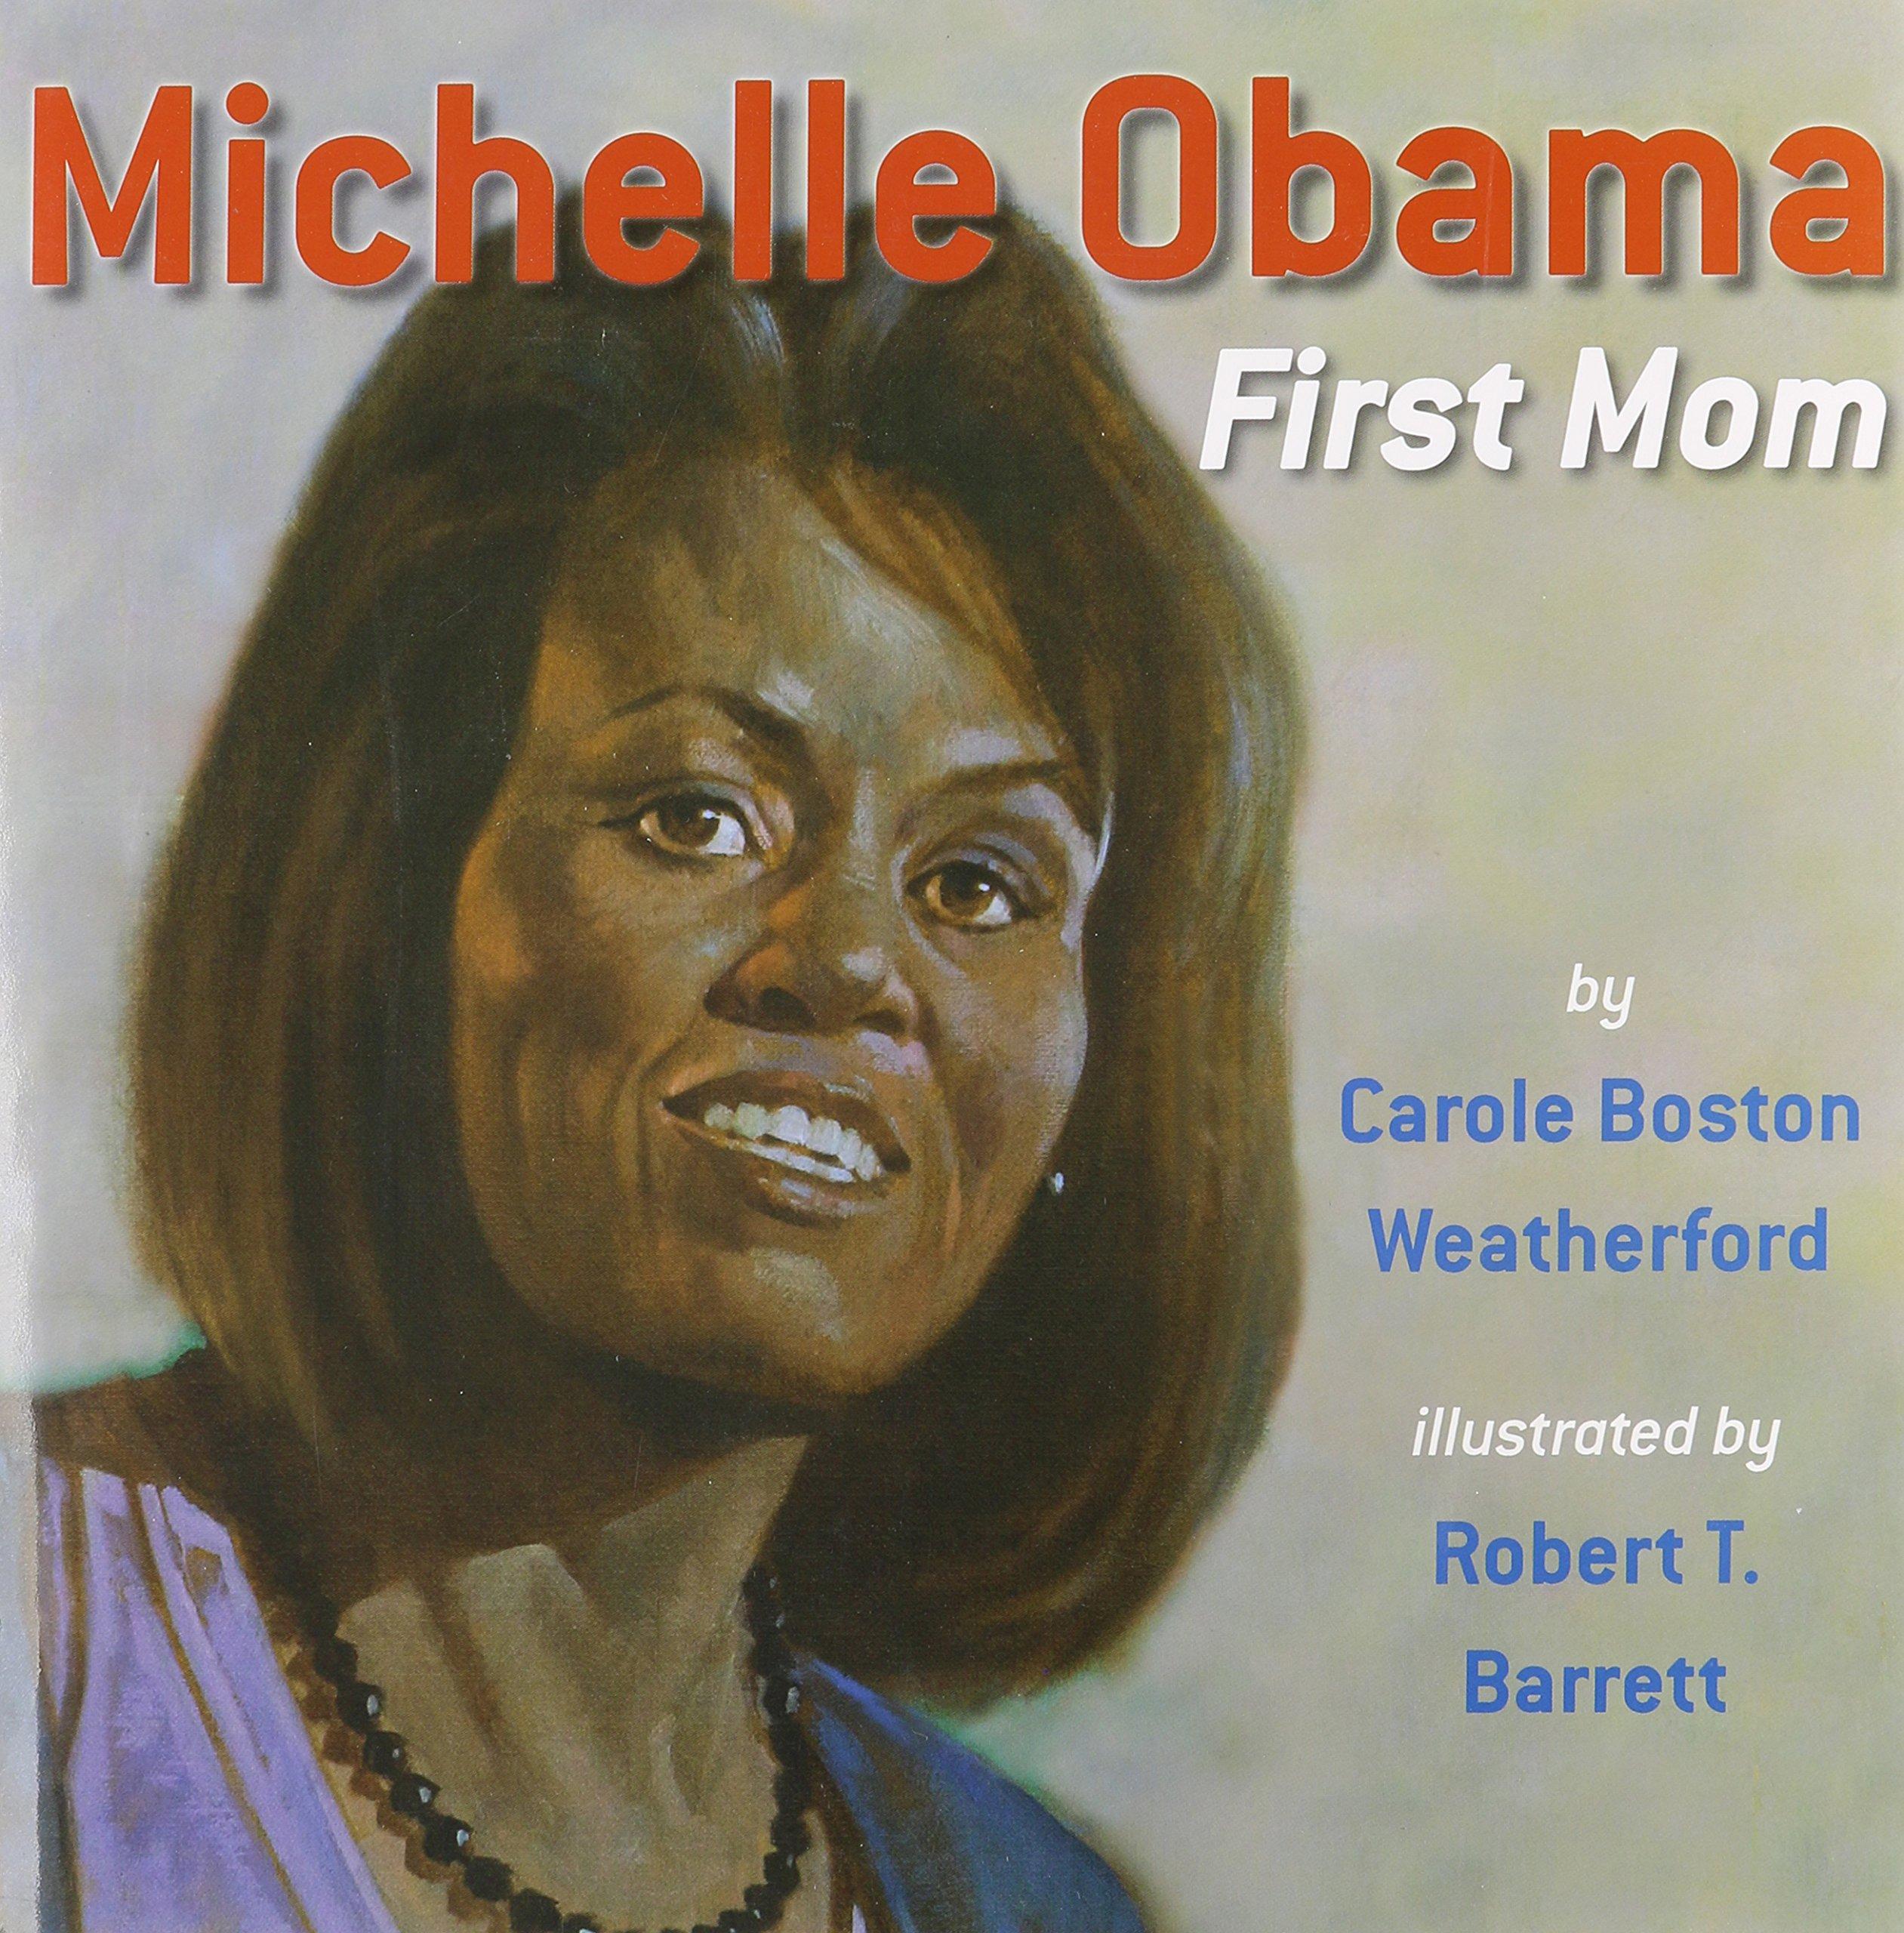 Michelle Obama: First Mom: Carole Boston Weatherford, Robert Barrett